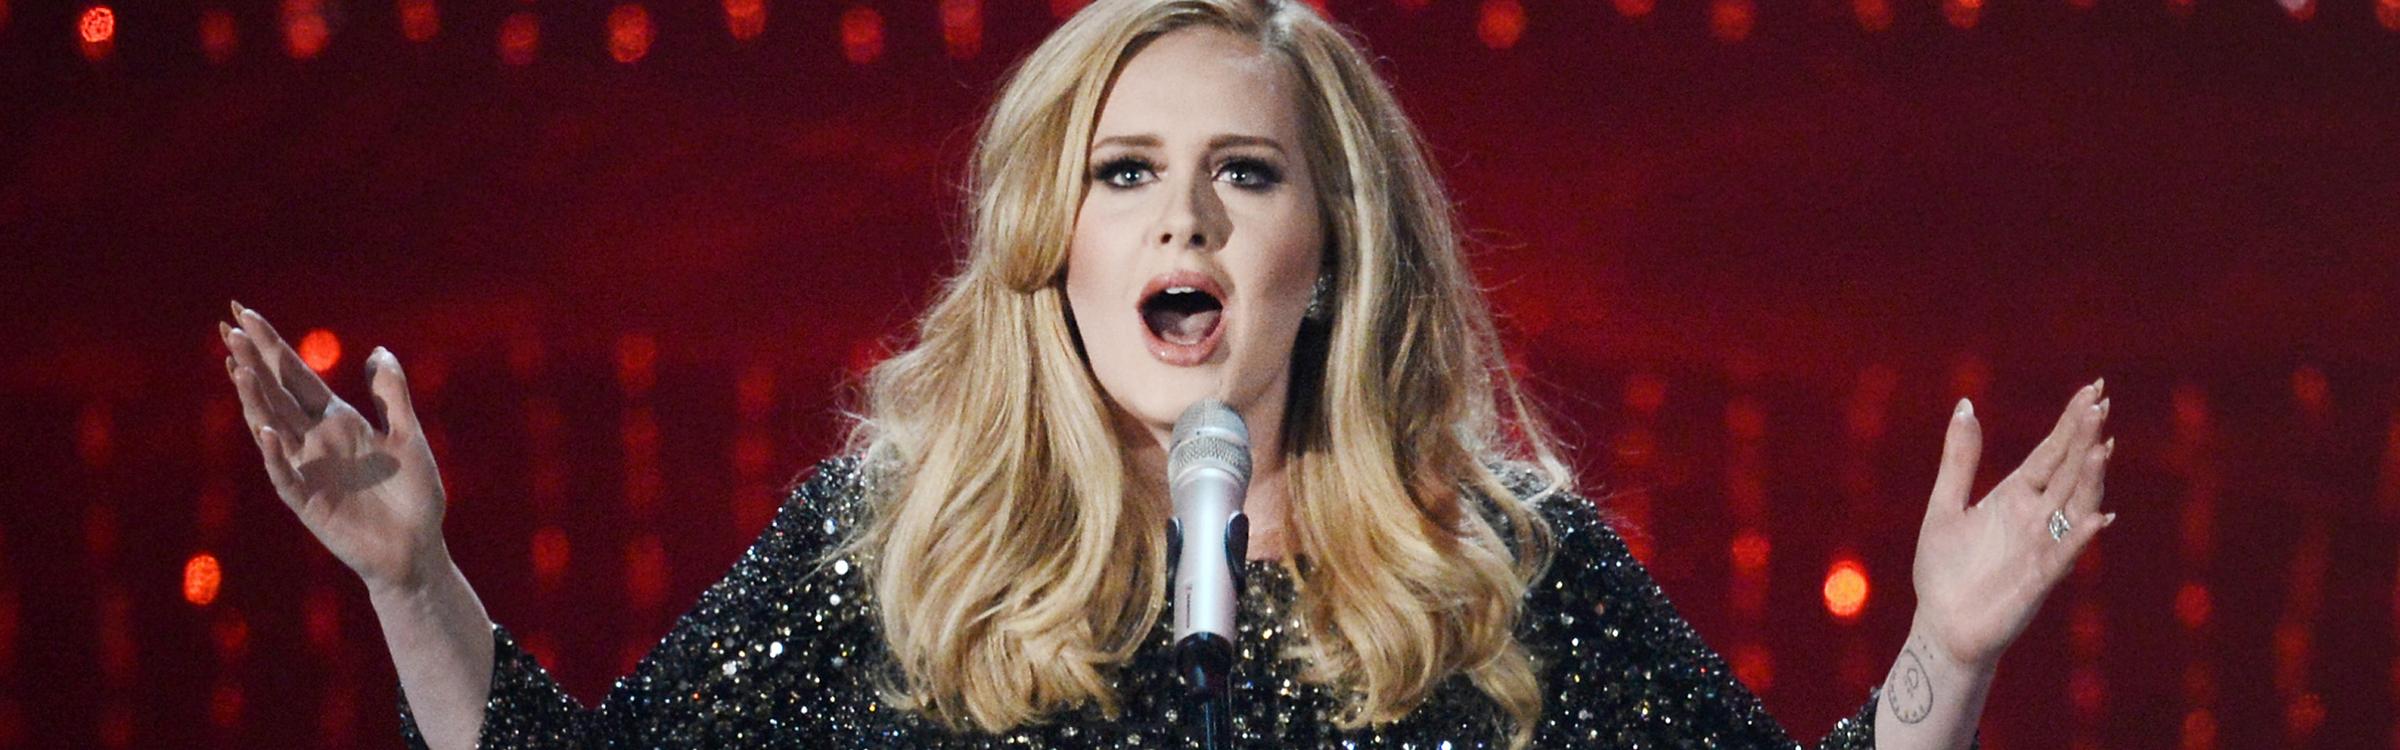 Adele2400